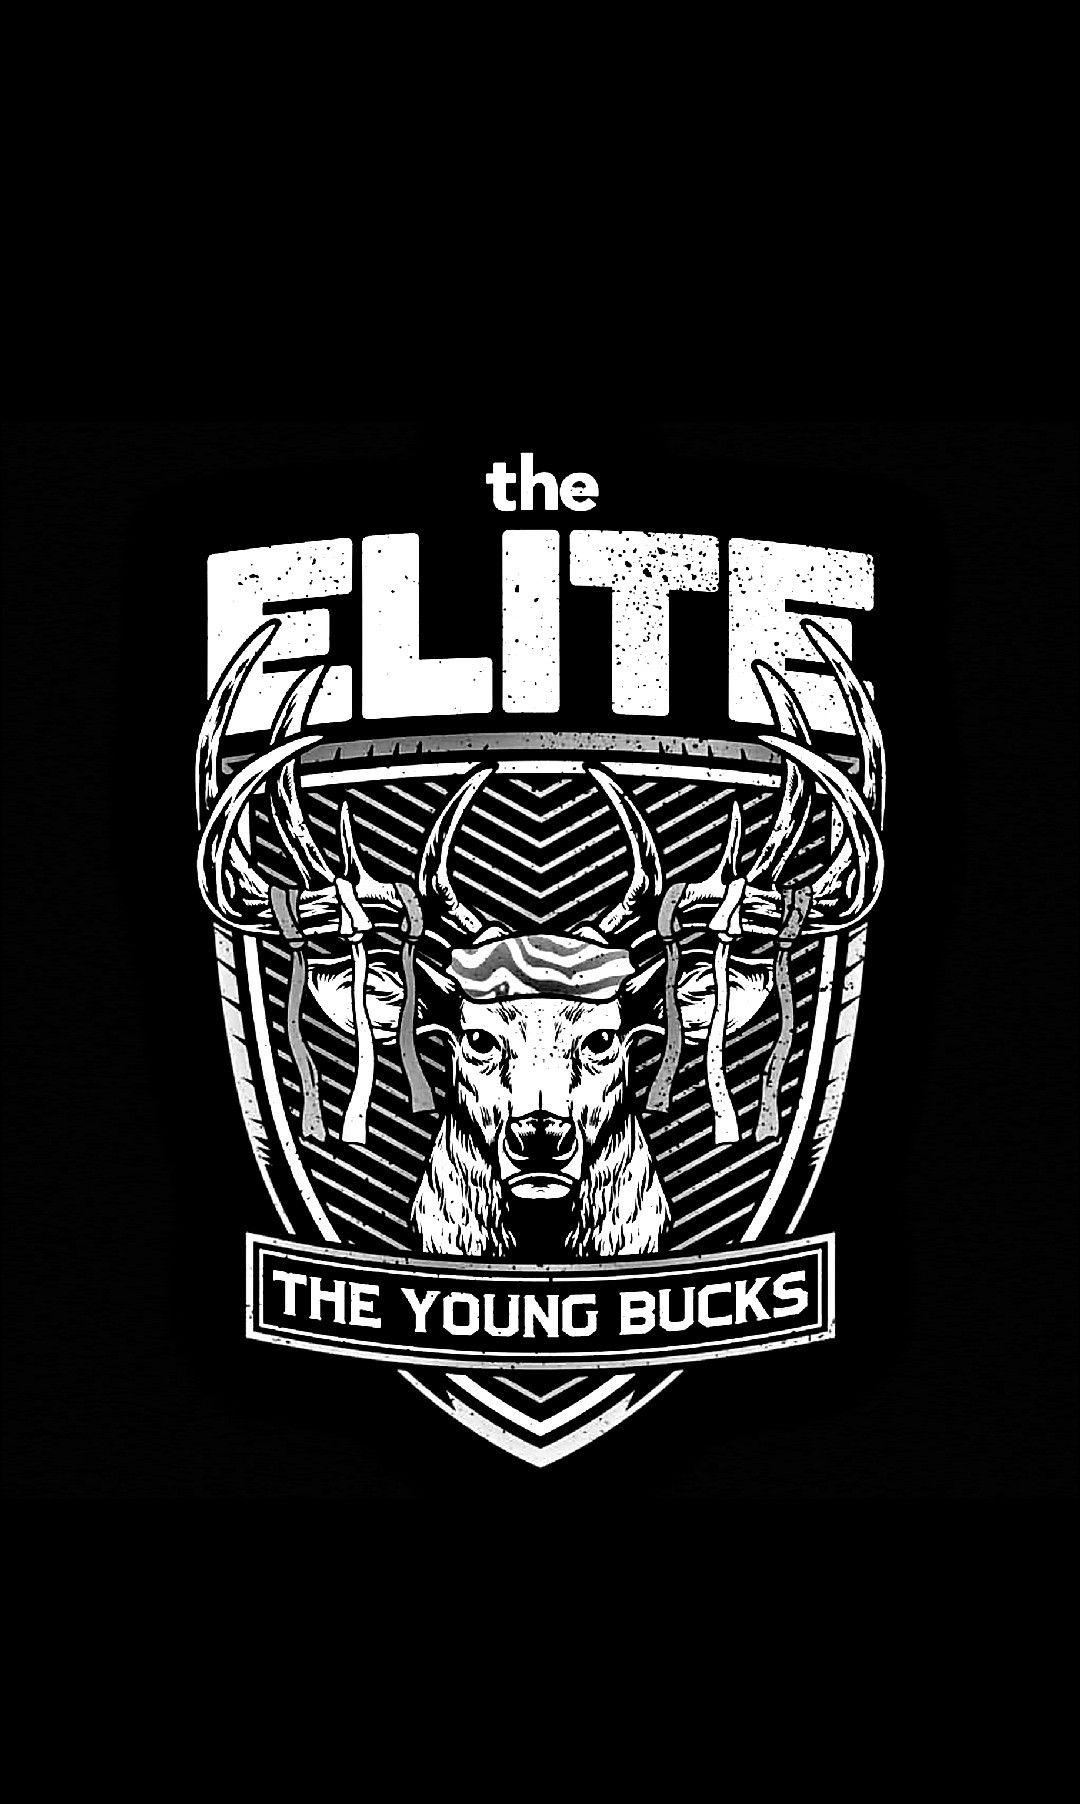 Pin By 란스 Lance On Wwe Njpw Young Bucks Professional Wrestling